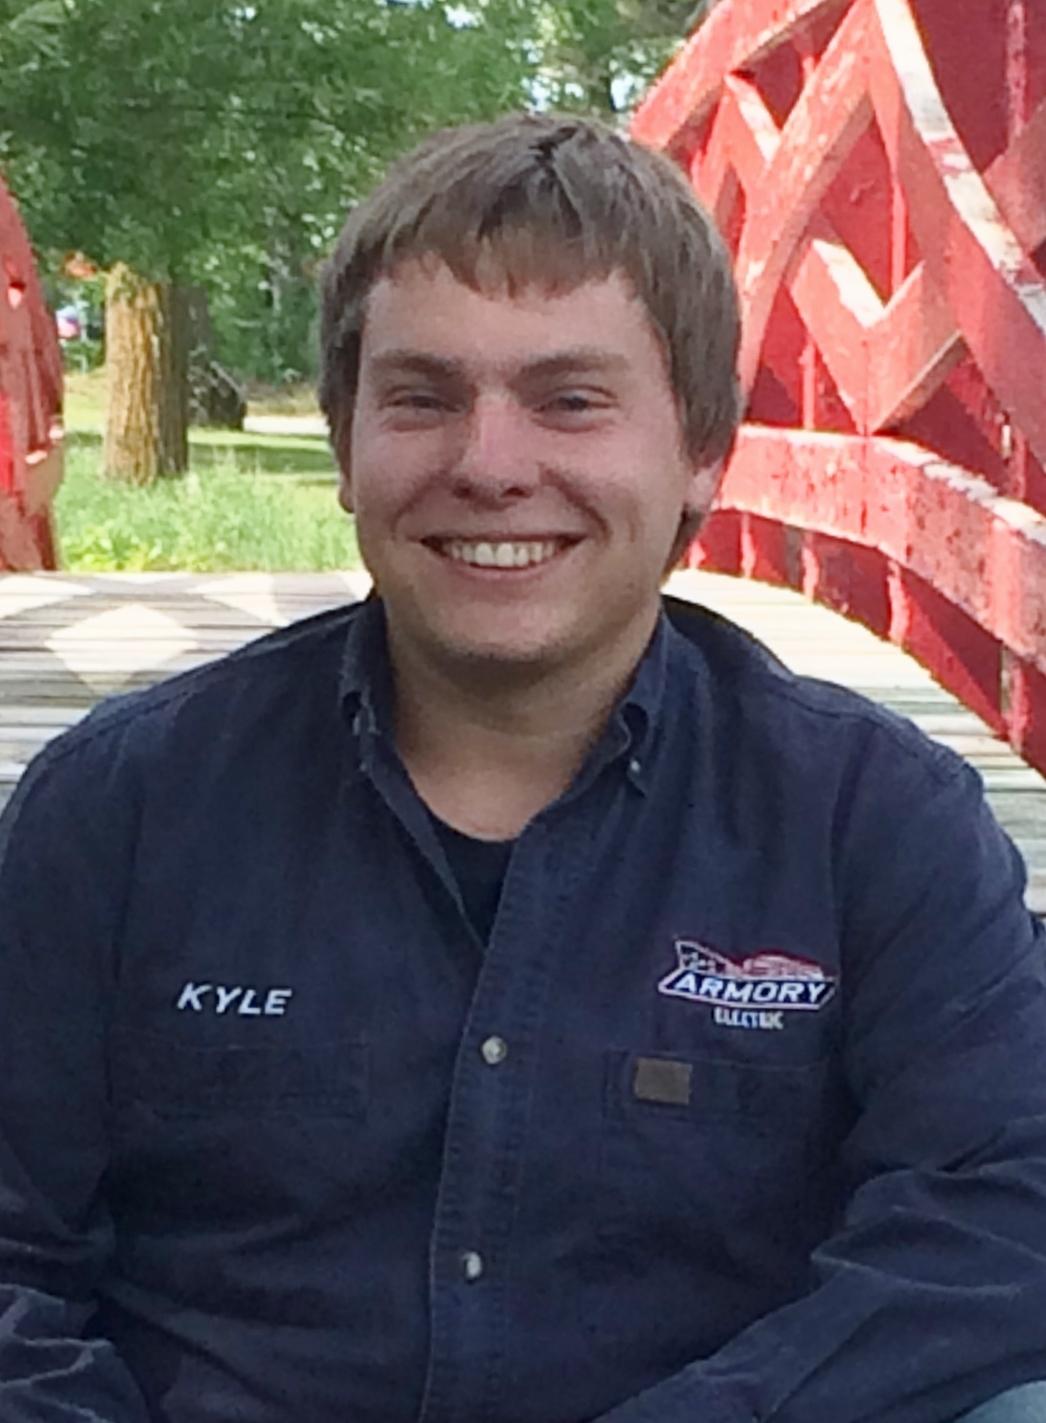 Kyle | Apprentice